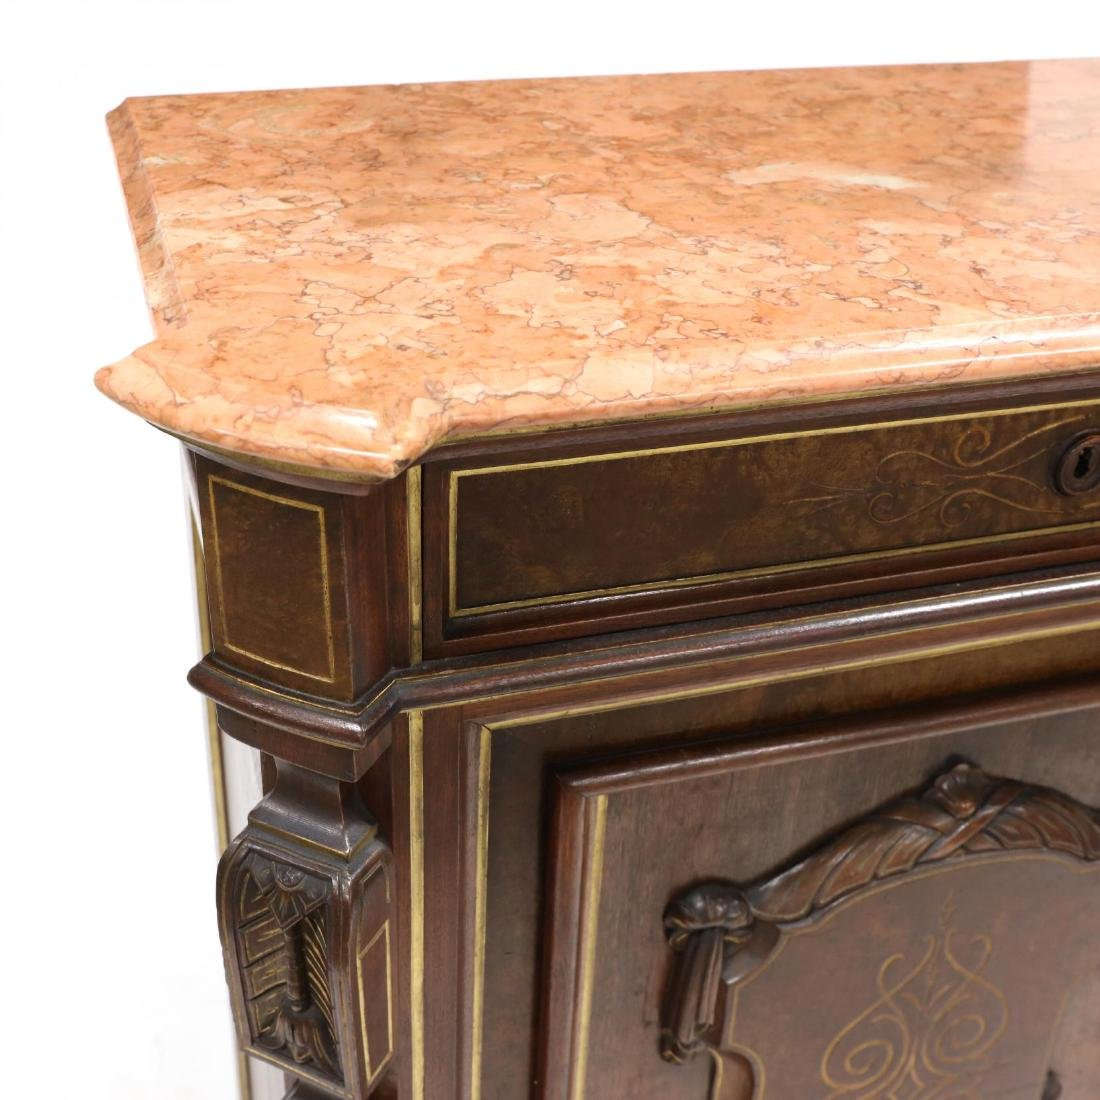 American Renaissance Revival Marble Top Cabinet - 3